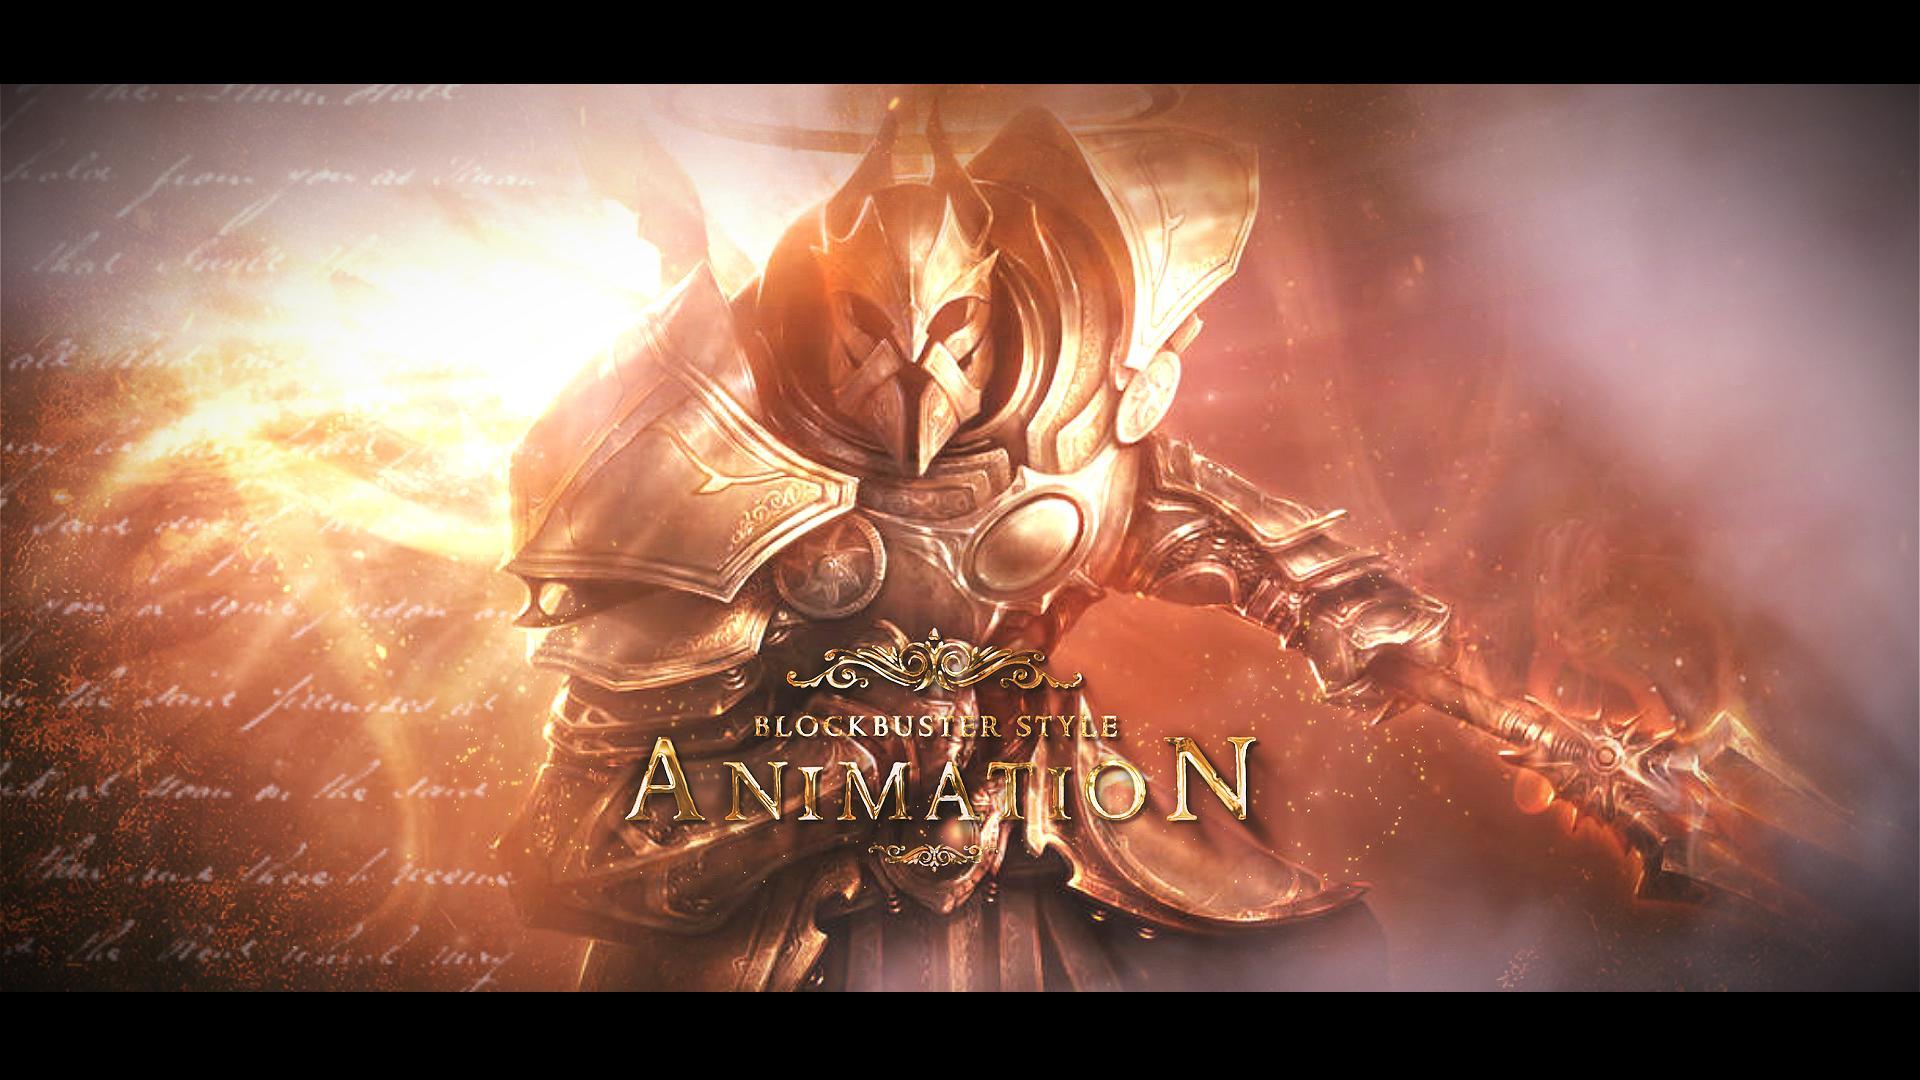 Archangel - Epic Fantasy Trailer - 9